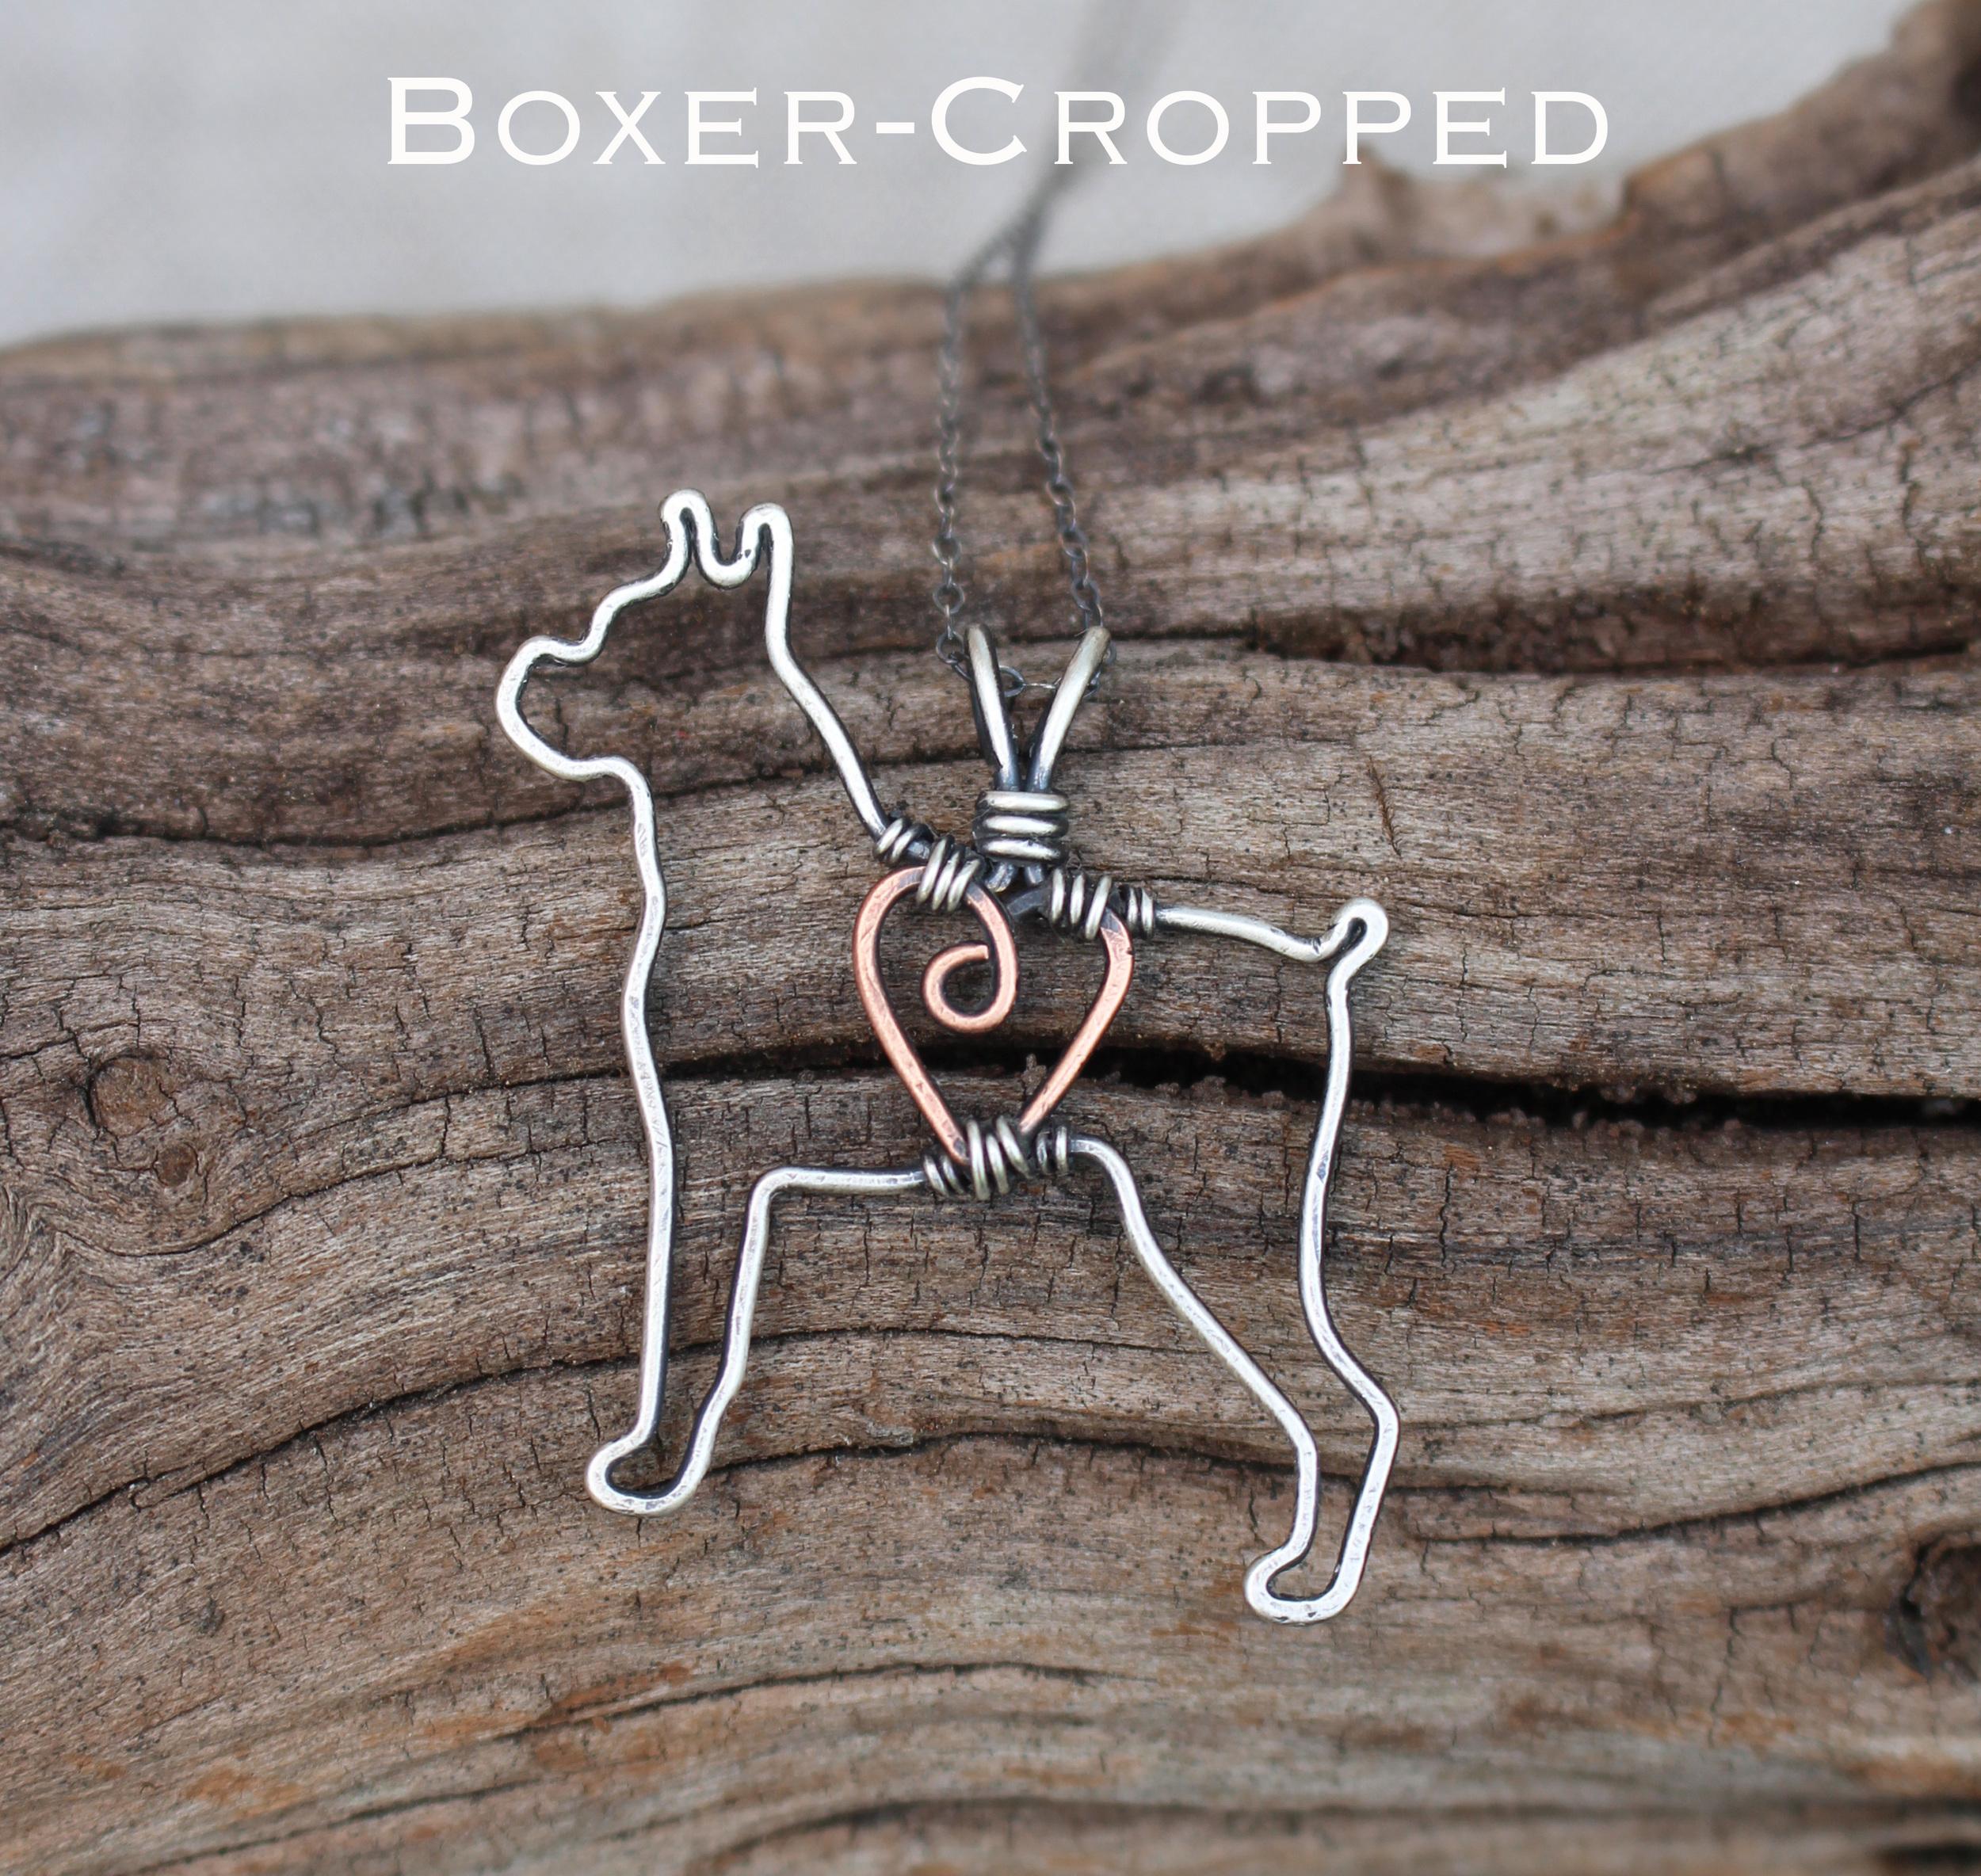 boxercropped.jpg